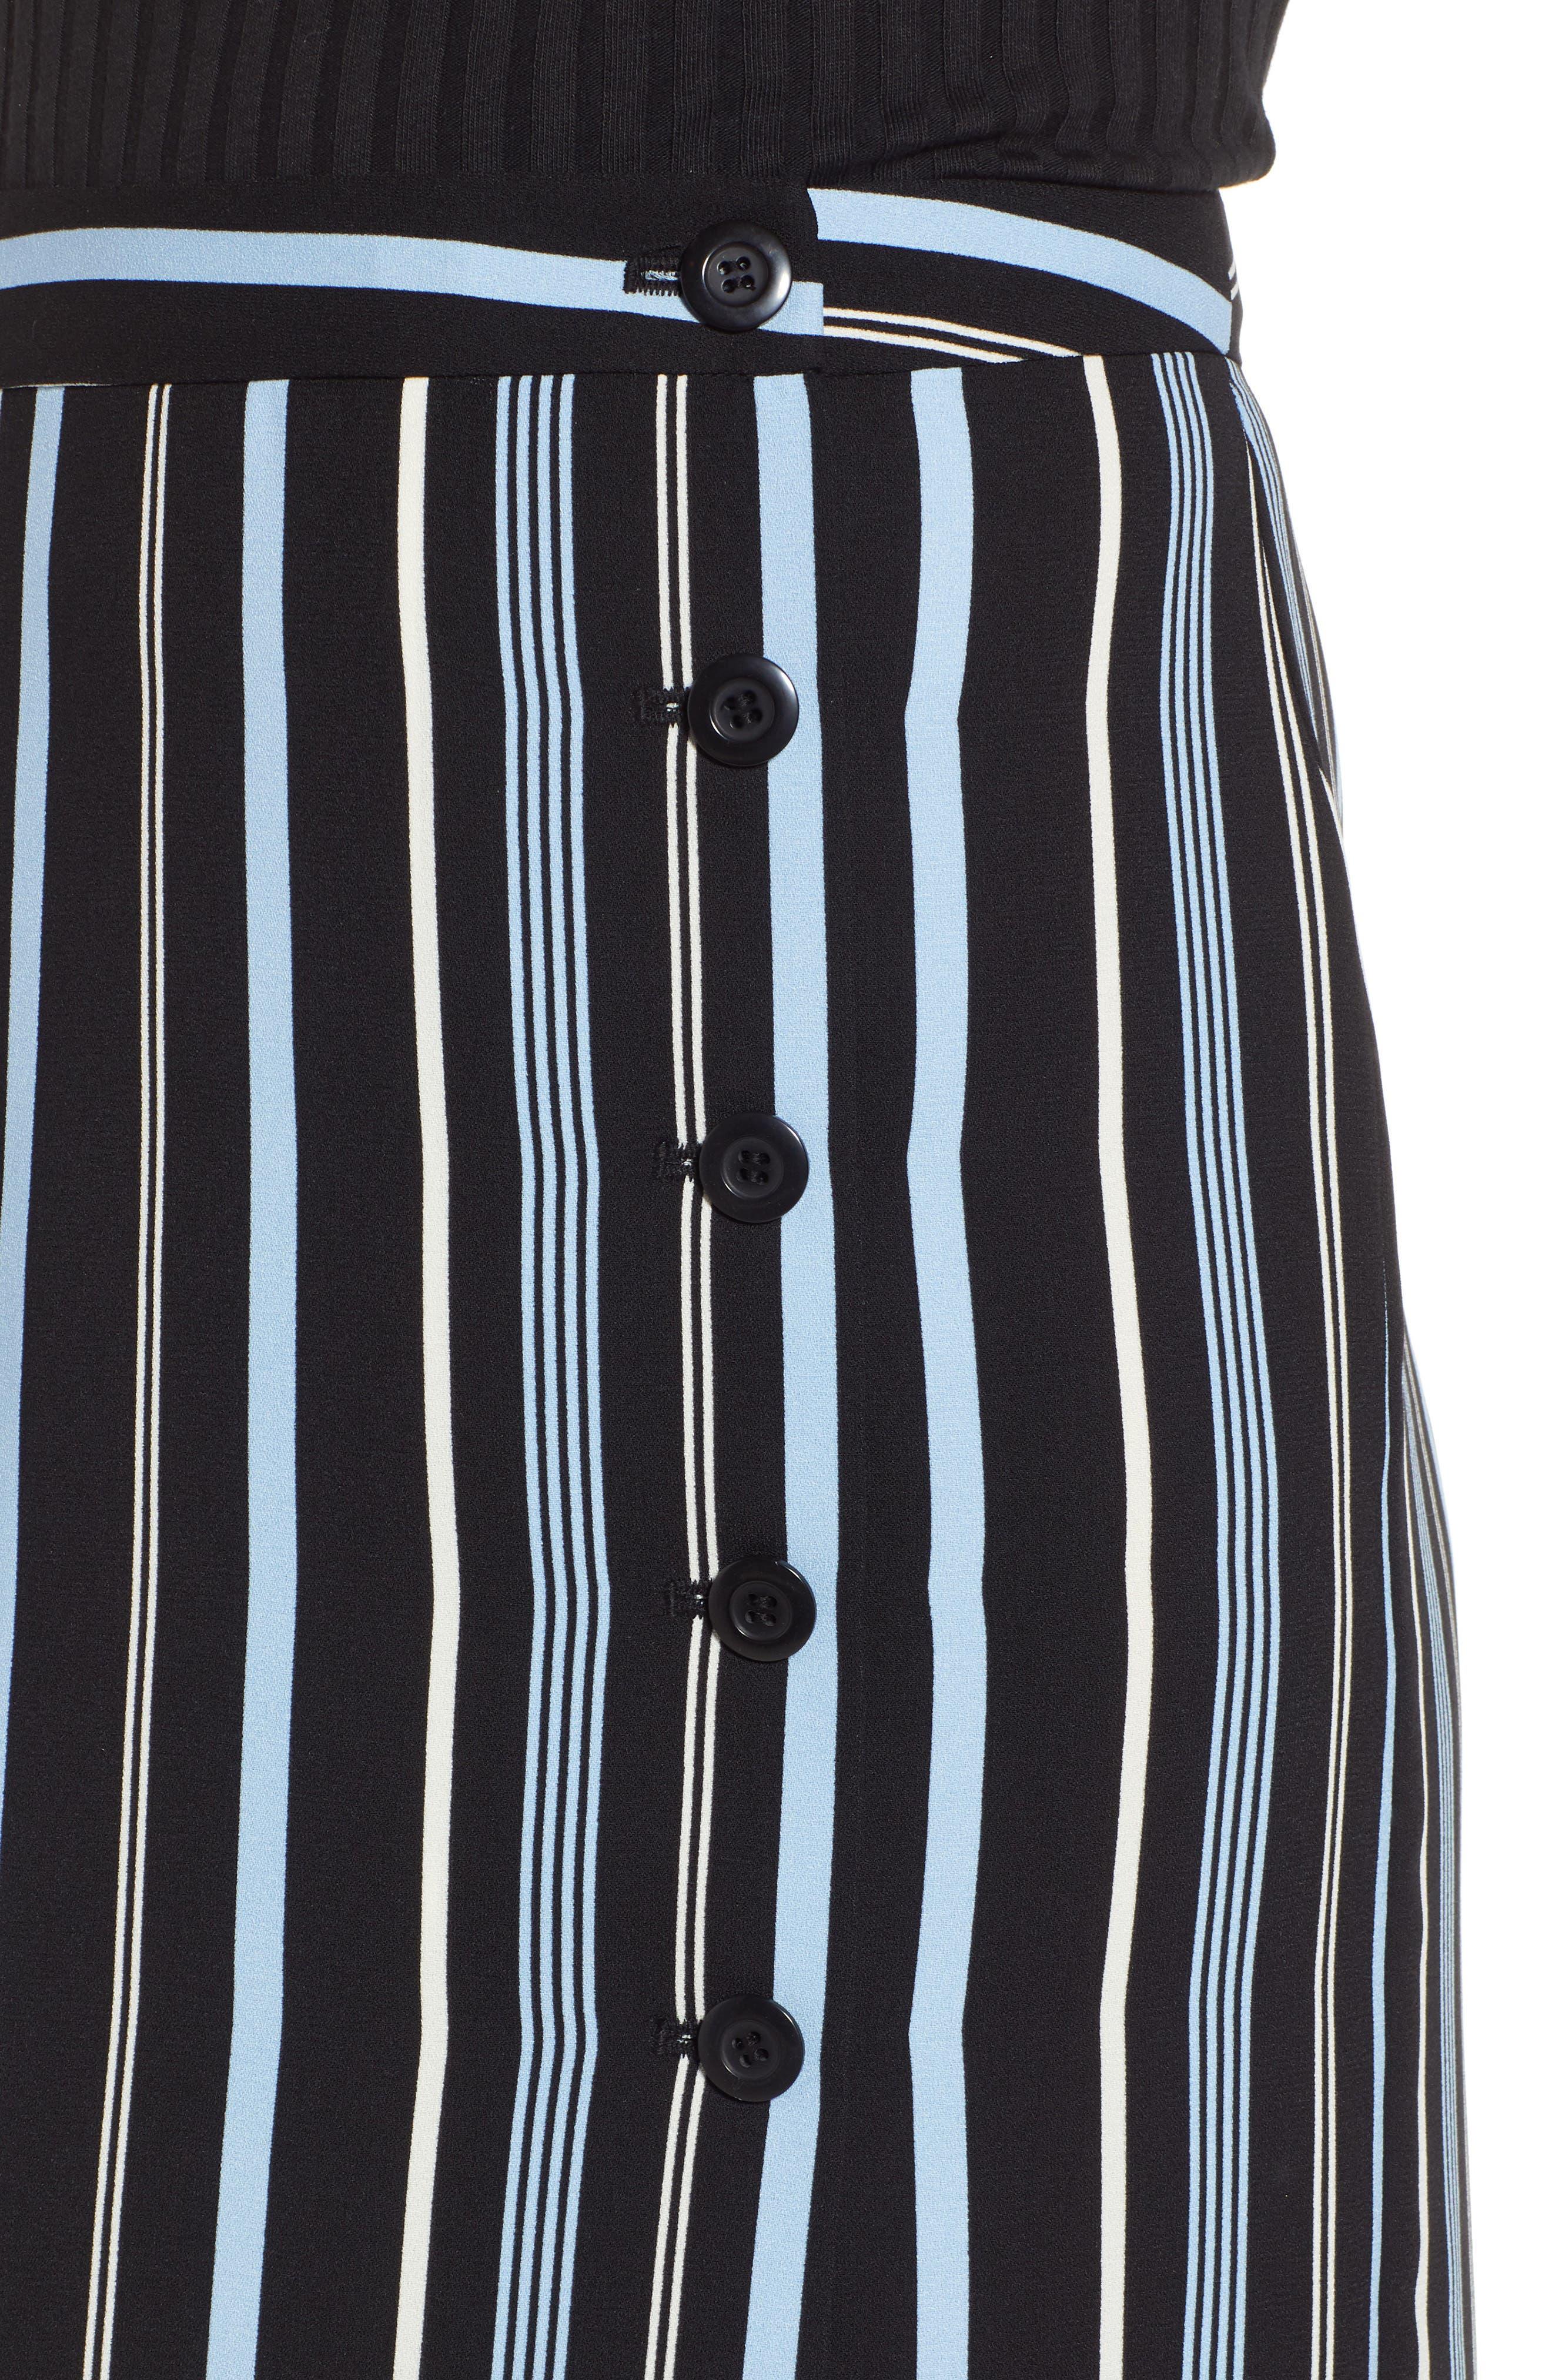 Button Wrap Skirt,                             Alternate thumbnail 5, color,                             BLACK MULTI COLORED STRIPE